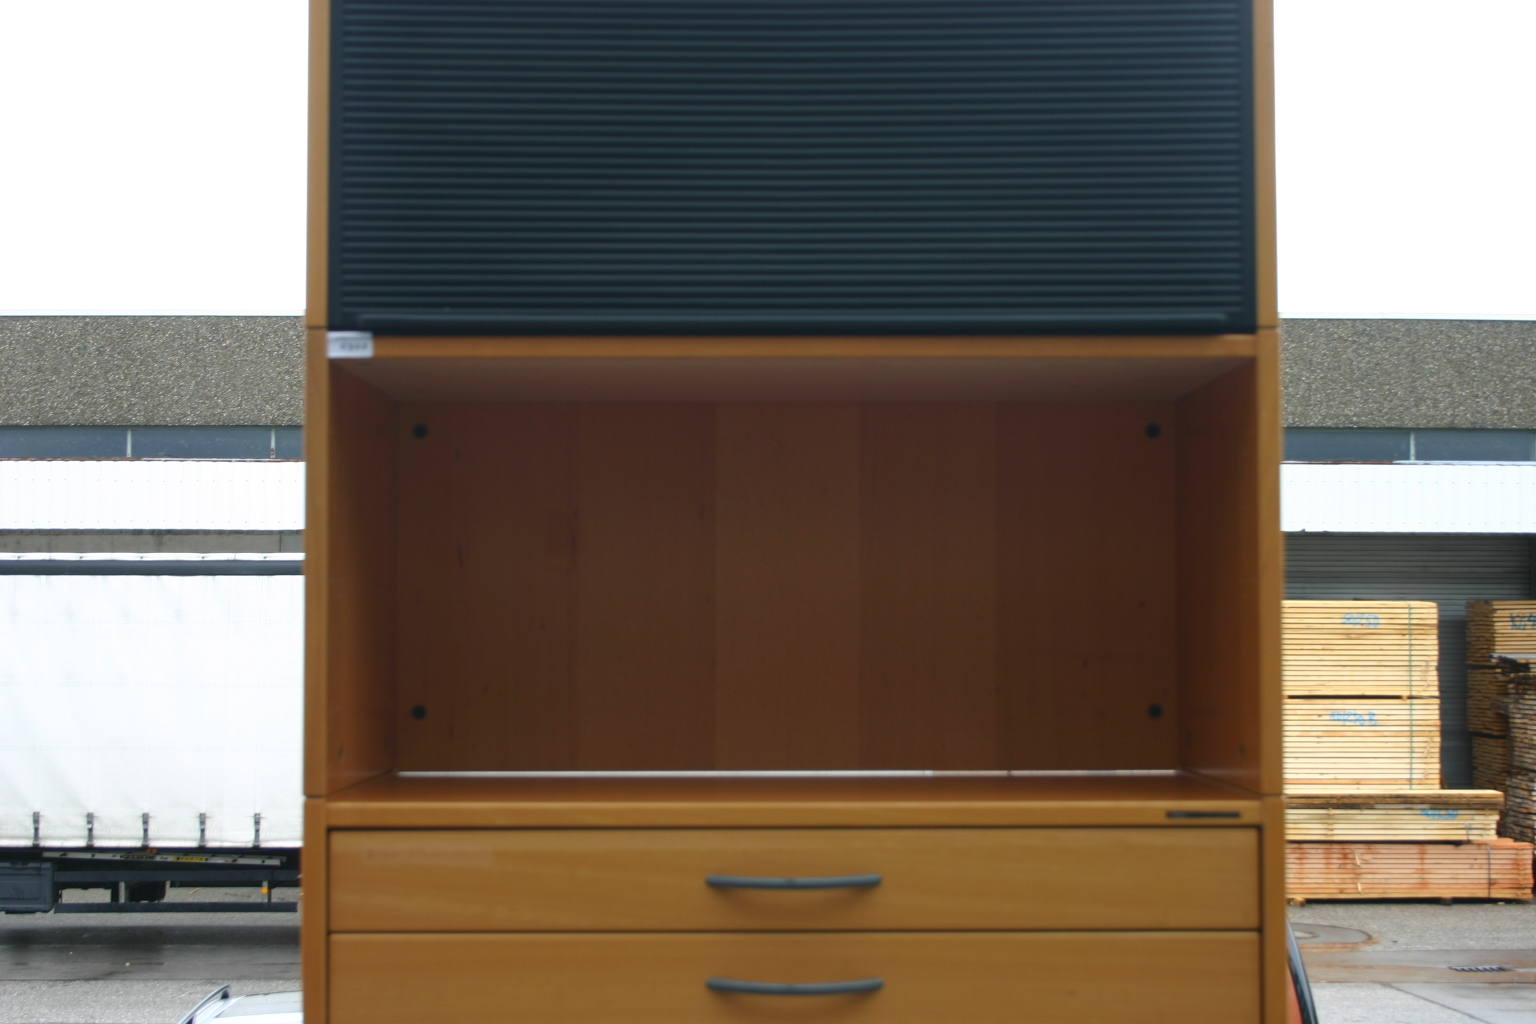 Büromöbel ikea effektiv  Brombel Ikea. Neu Buromobel Ikea Business Assmann Brombel ...